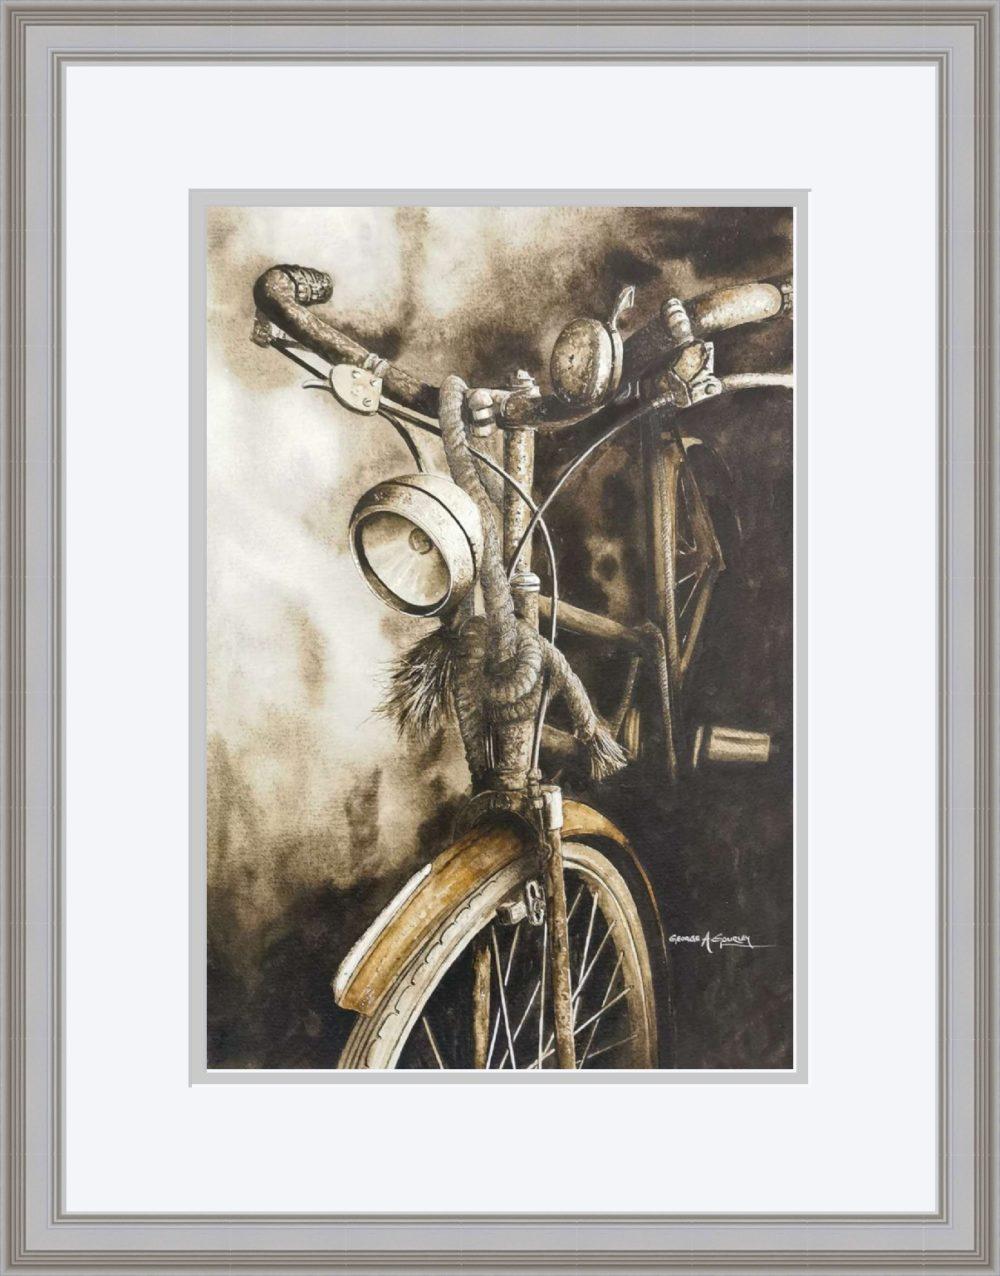 The Old Timer in Grey Frame